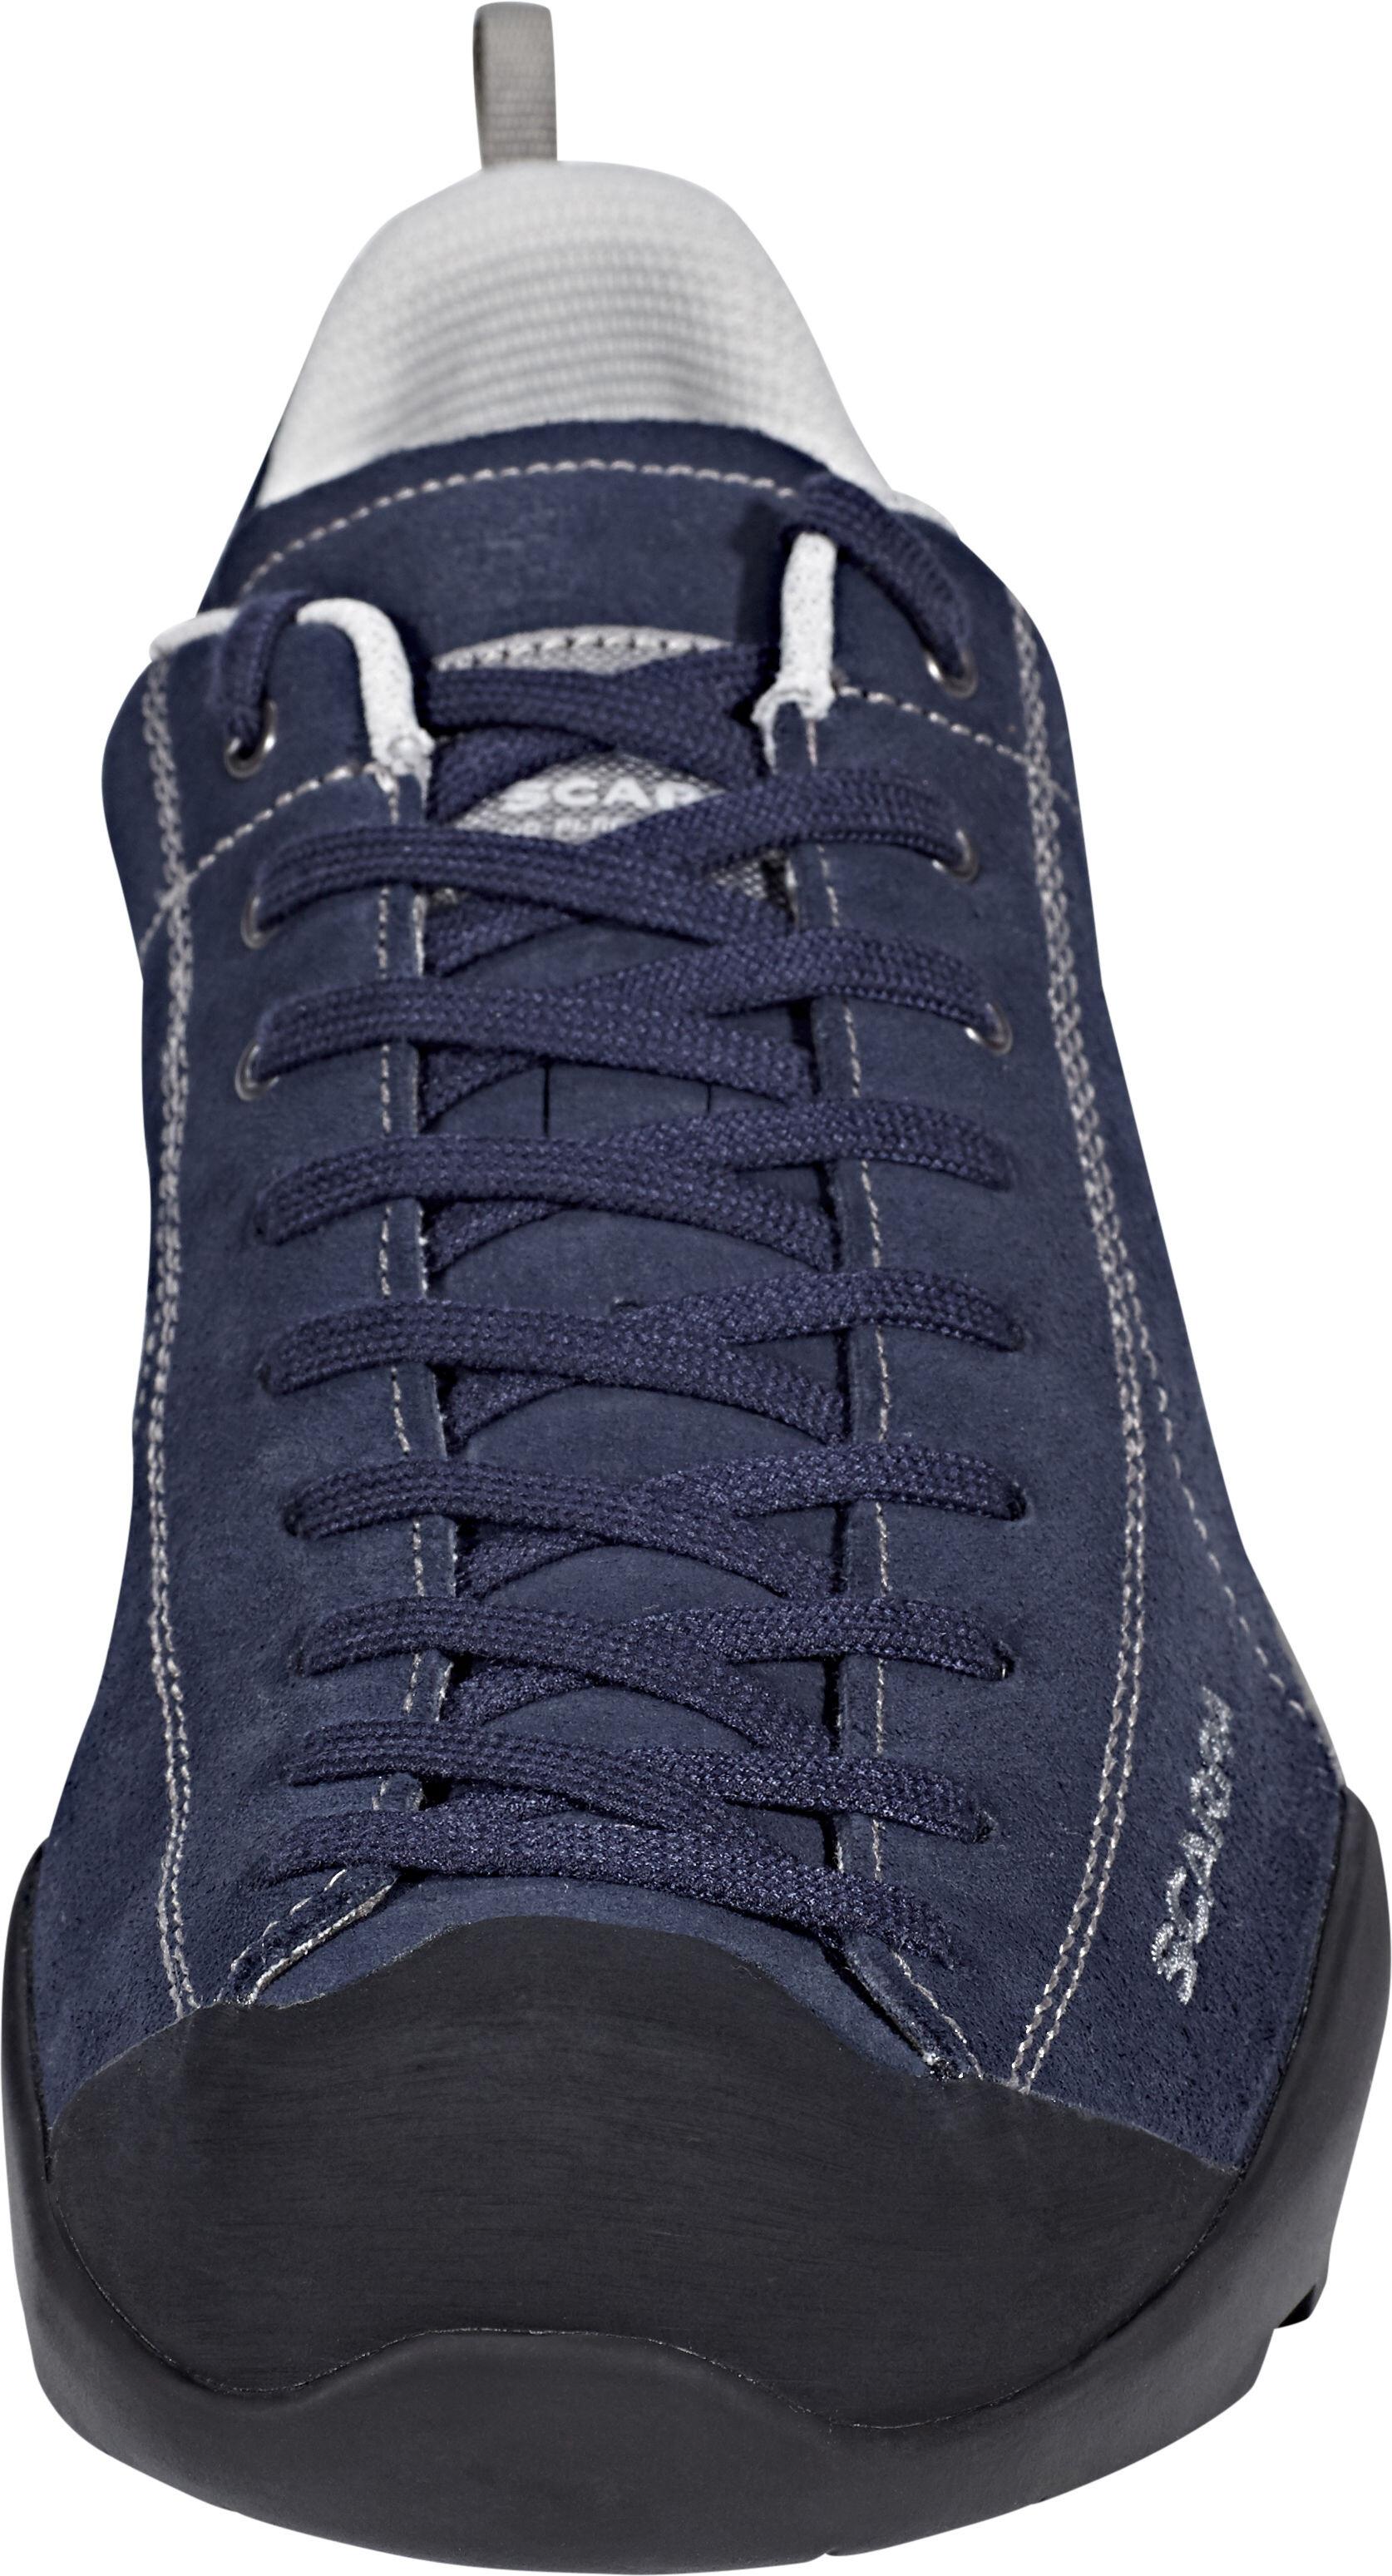 9a58b8159f75 Scarpa Mojito GTX Shoes blue cosmo at Addnature.co.uk